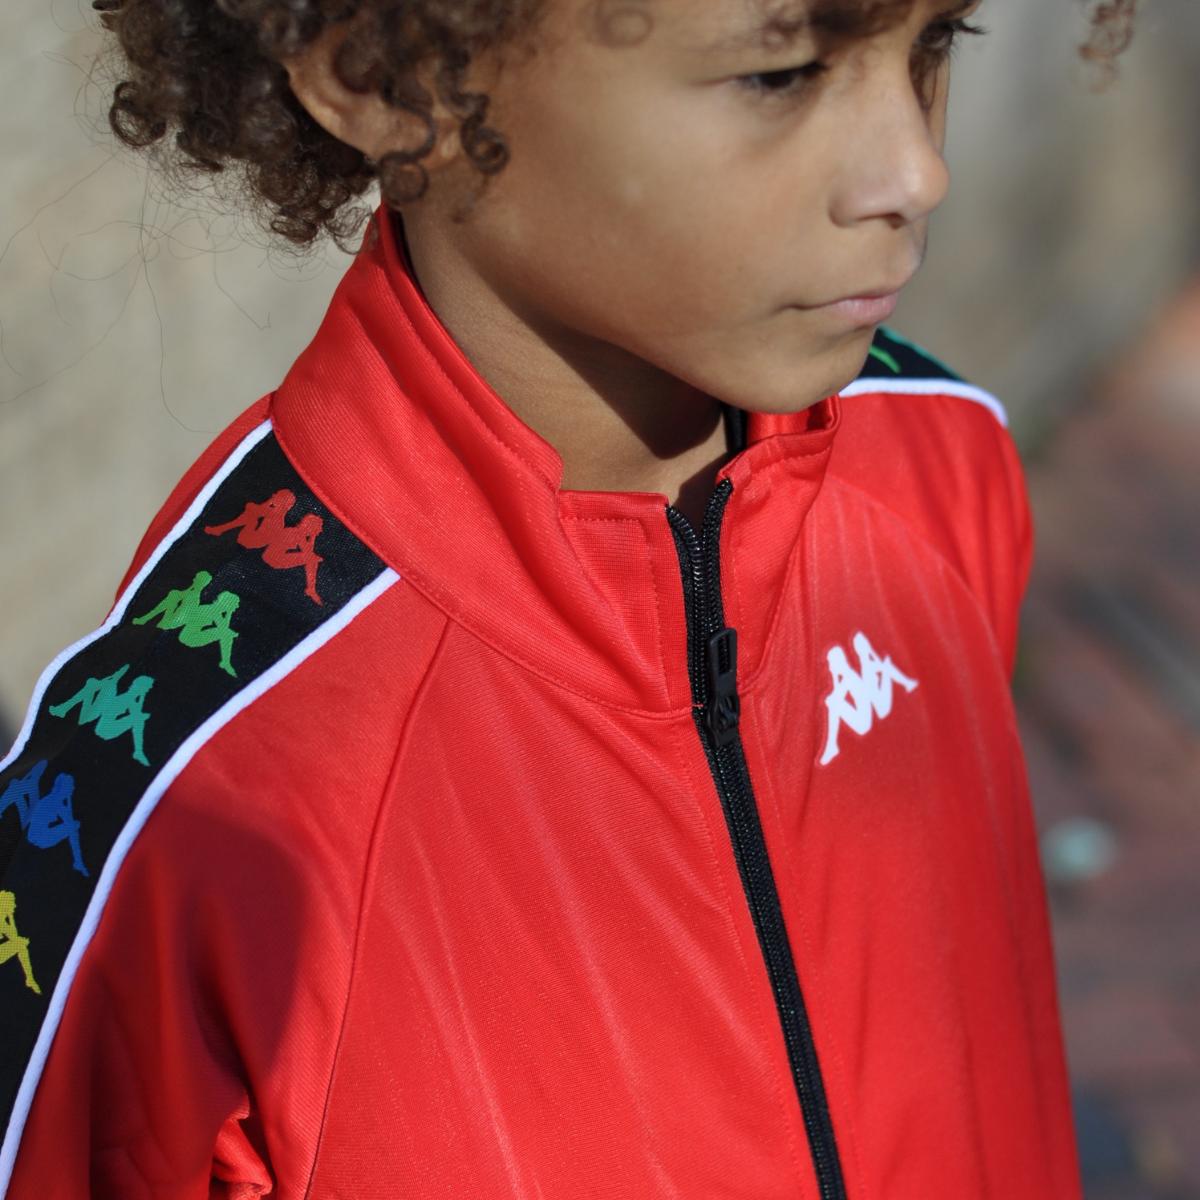 sala Prosperar Shuraba  New In The Shop - Iconic Sportswear Brand Kappa | Kids fall outfits, Kids  accessories fashion, Gender neutral kids clothes